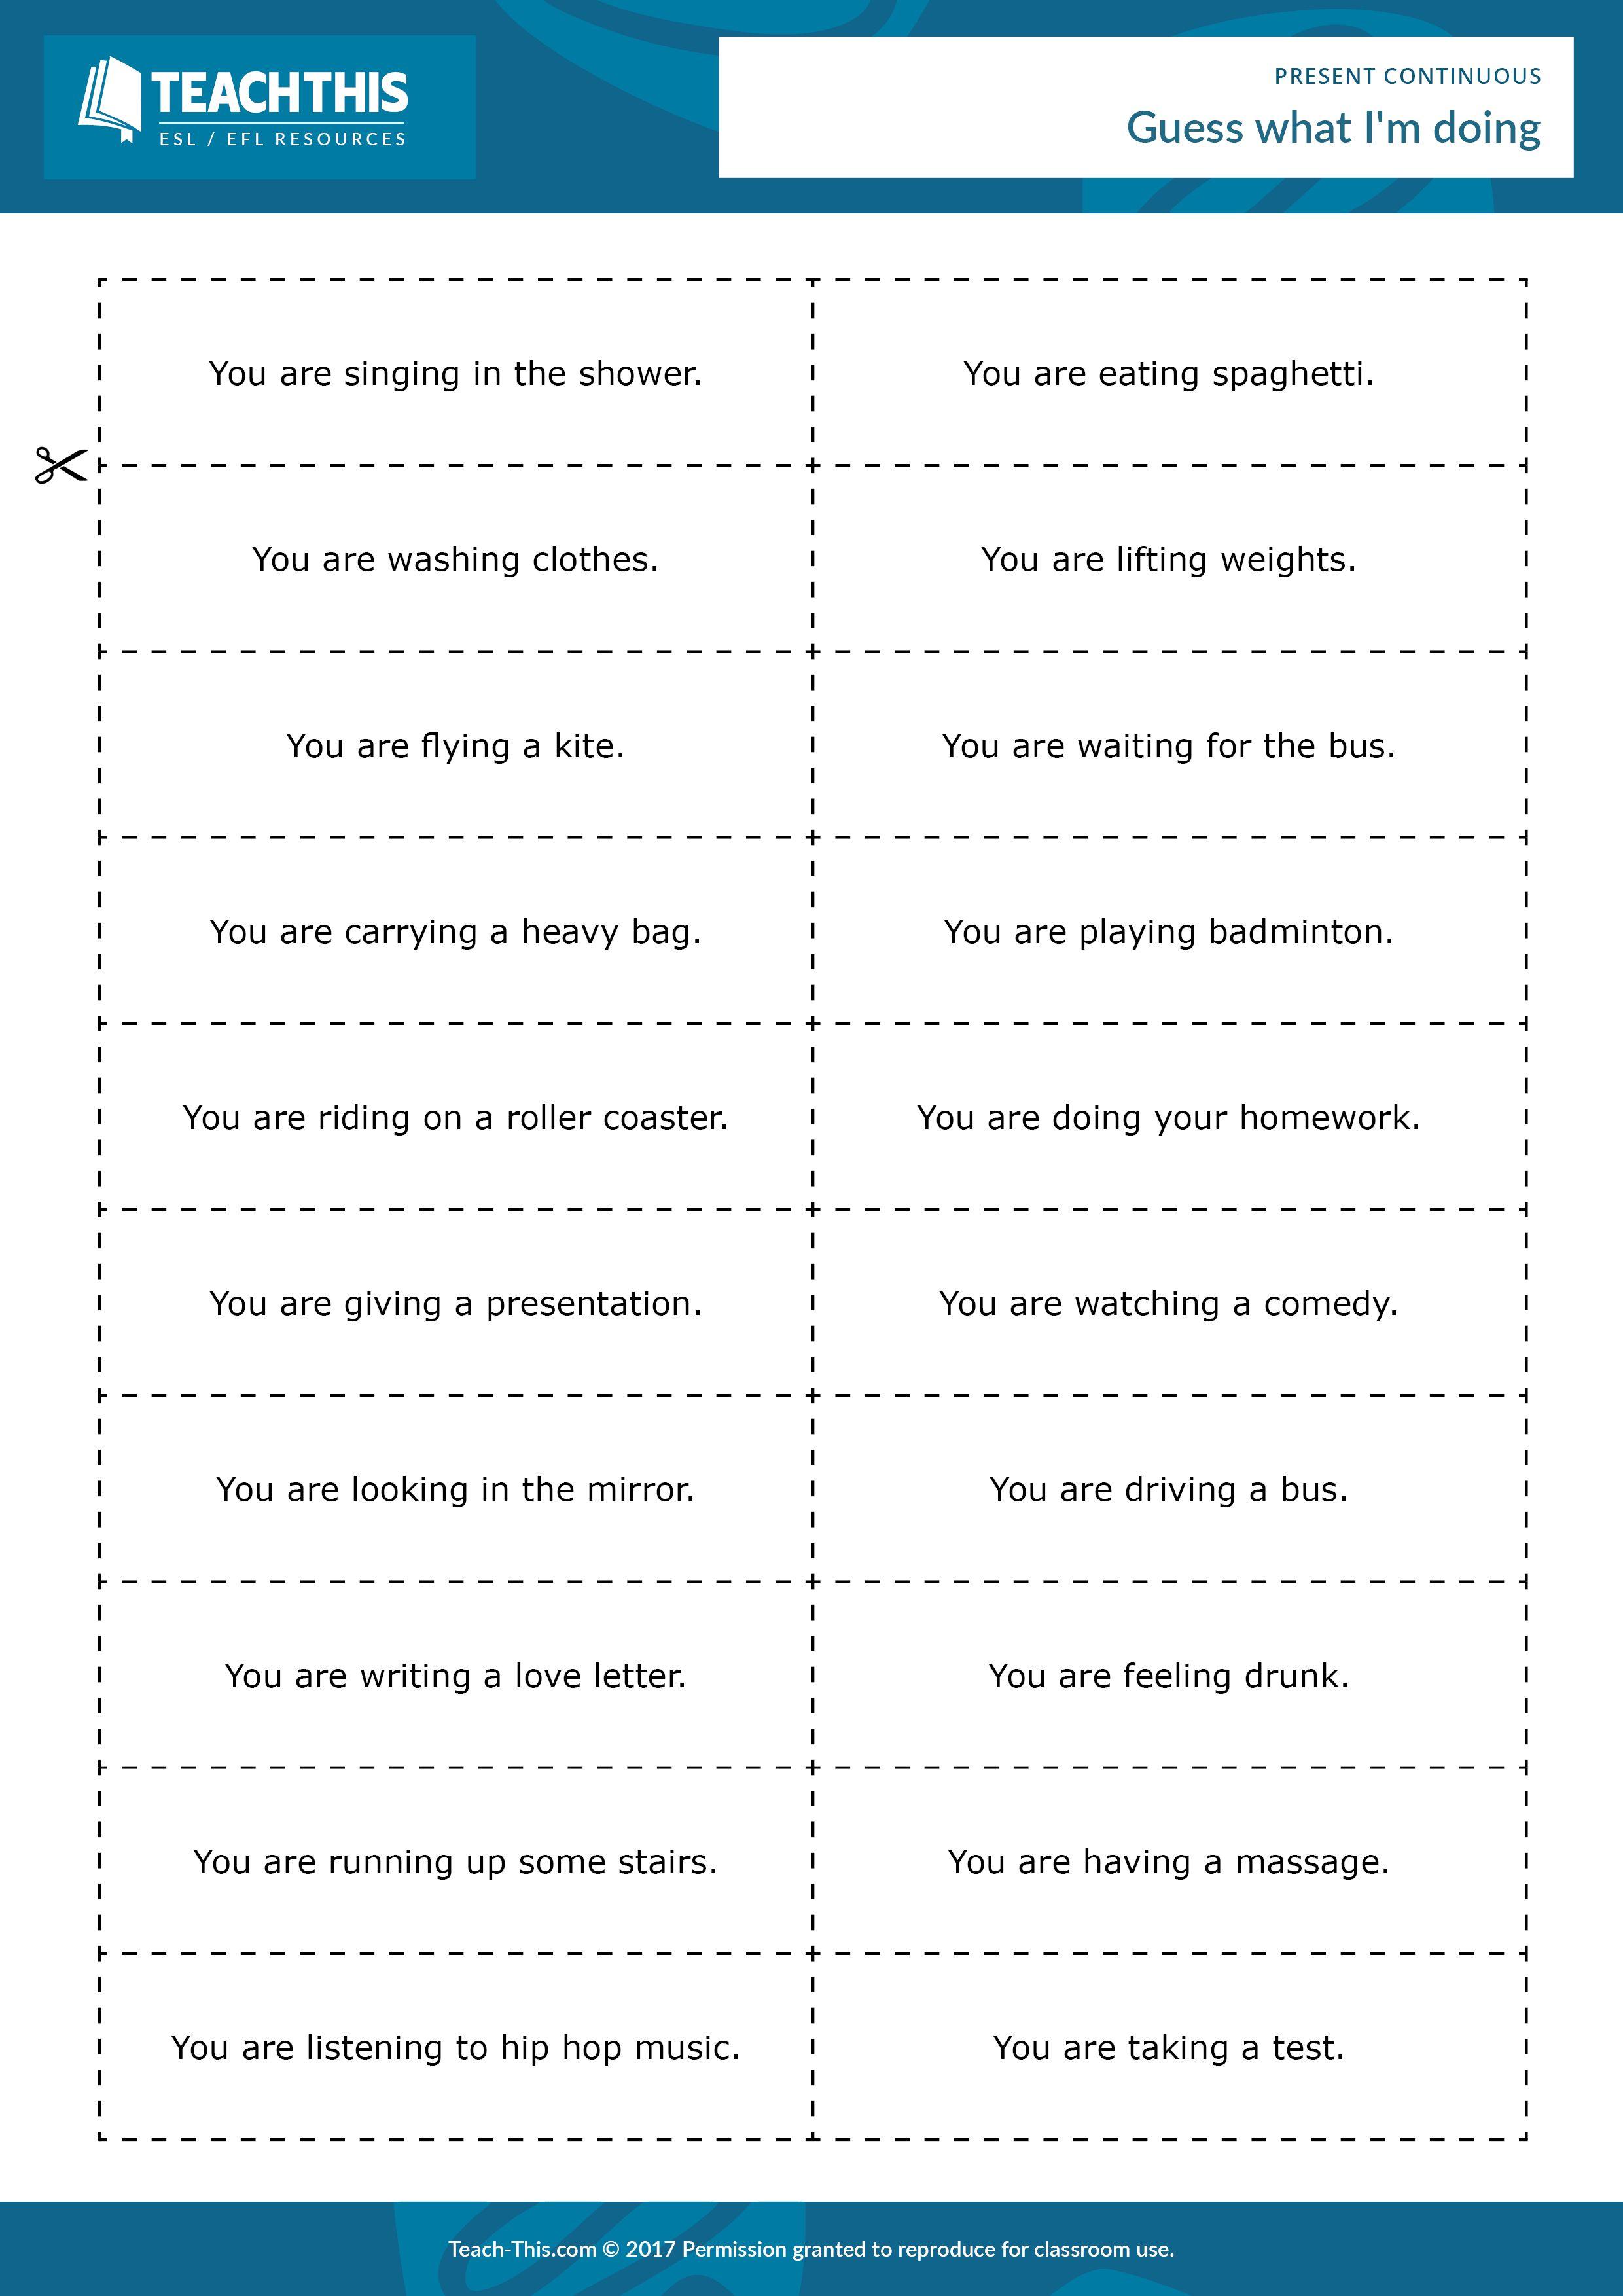 8e27bfb0c5dc045f9f9397a5889a8675 Teaching English For Beginners Worksheets on english worksheets for teachers, esl for beginners, vocabulary for beginners, game for beginners, animals for beginners, criss cross for beginners, english worksheets for intermediate, coloring pages for beginners, writing for beginners, english worksheets for adults,